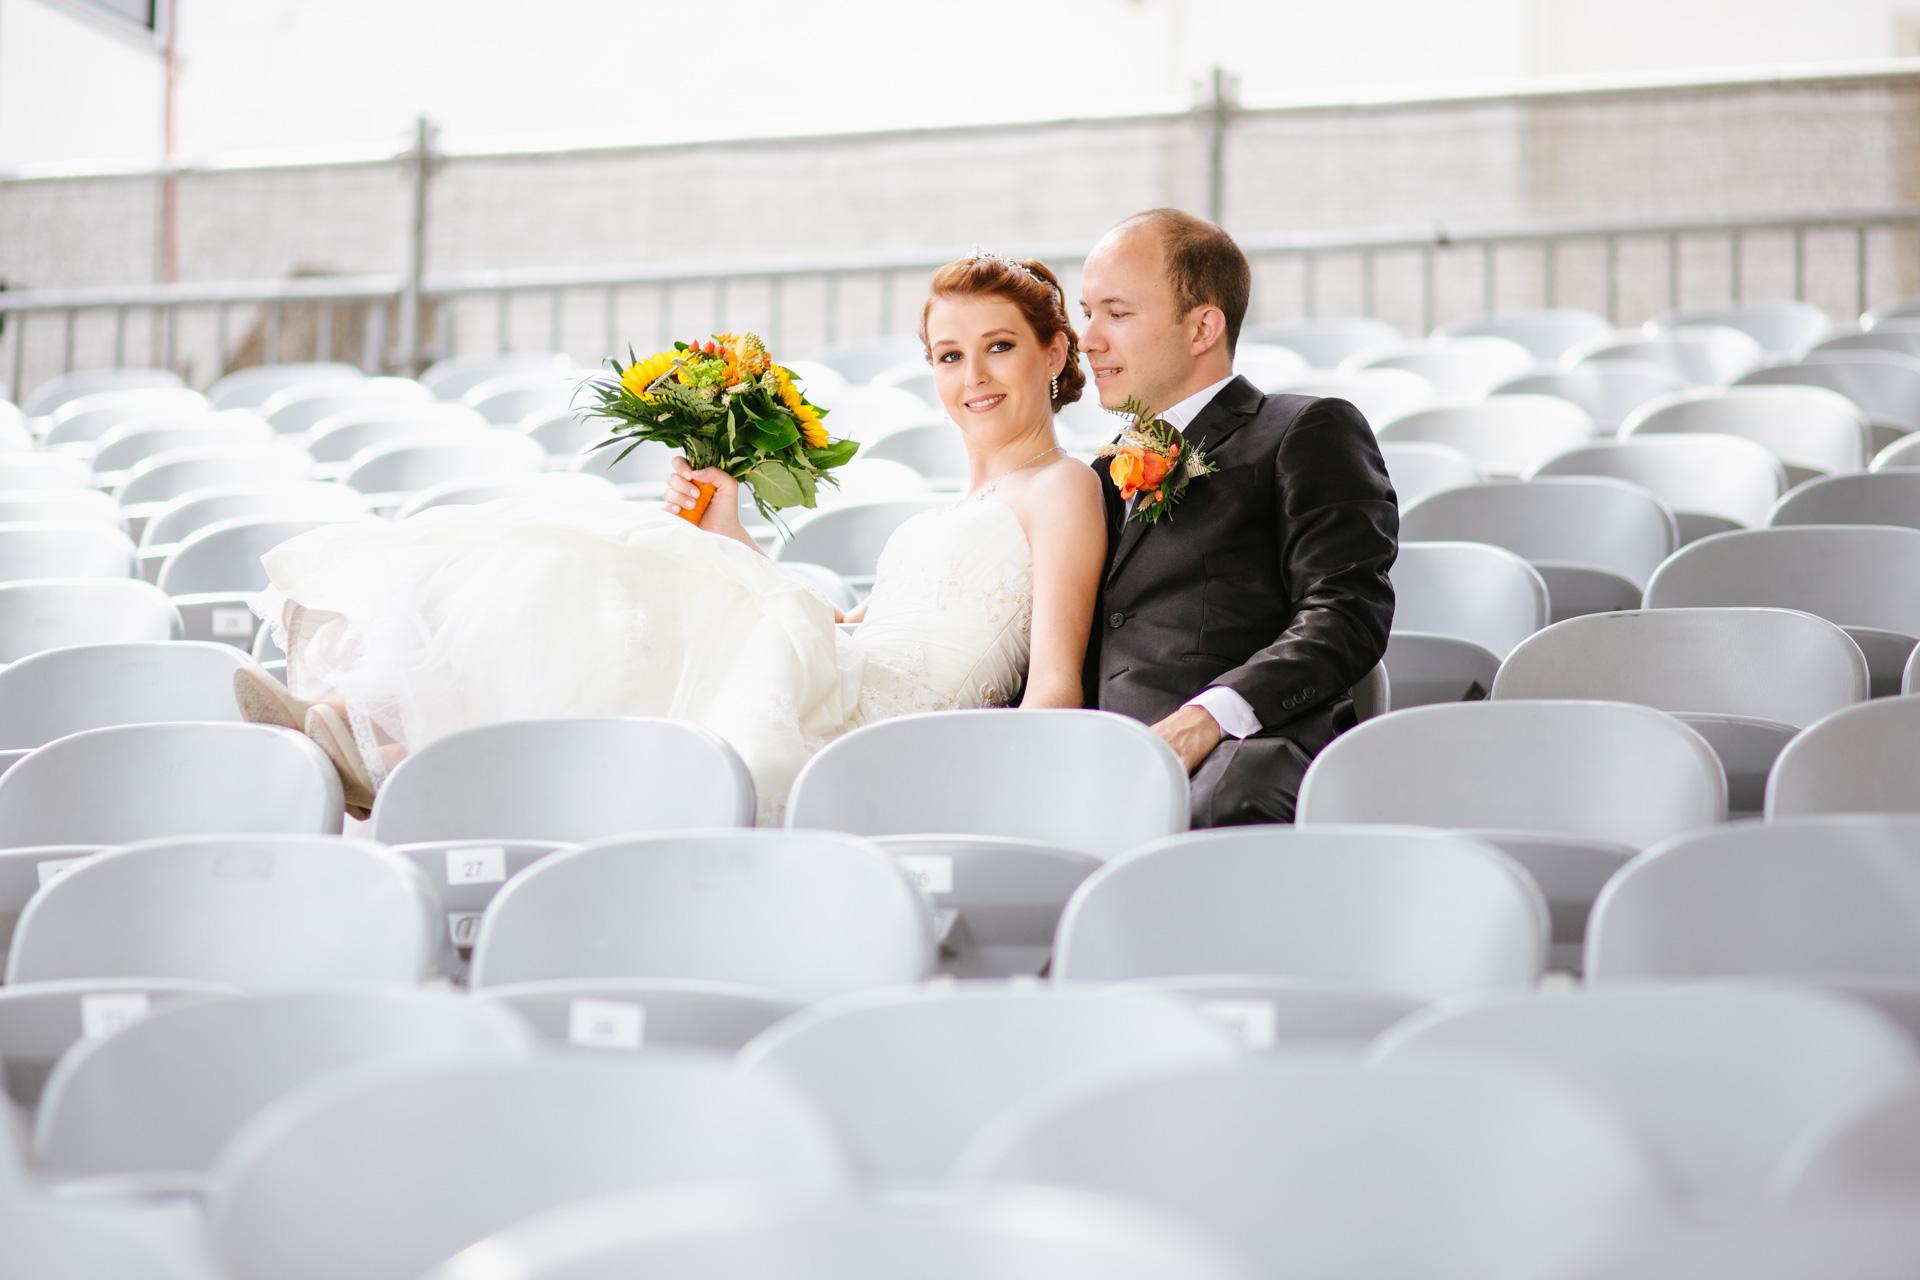 Pixelart_Hochzeitsfotografen_Loerrach_Rheinfelden_Hallwil_Schweiz_Linda-Ramon-1012